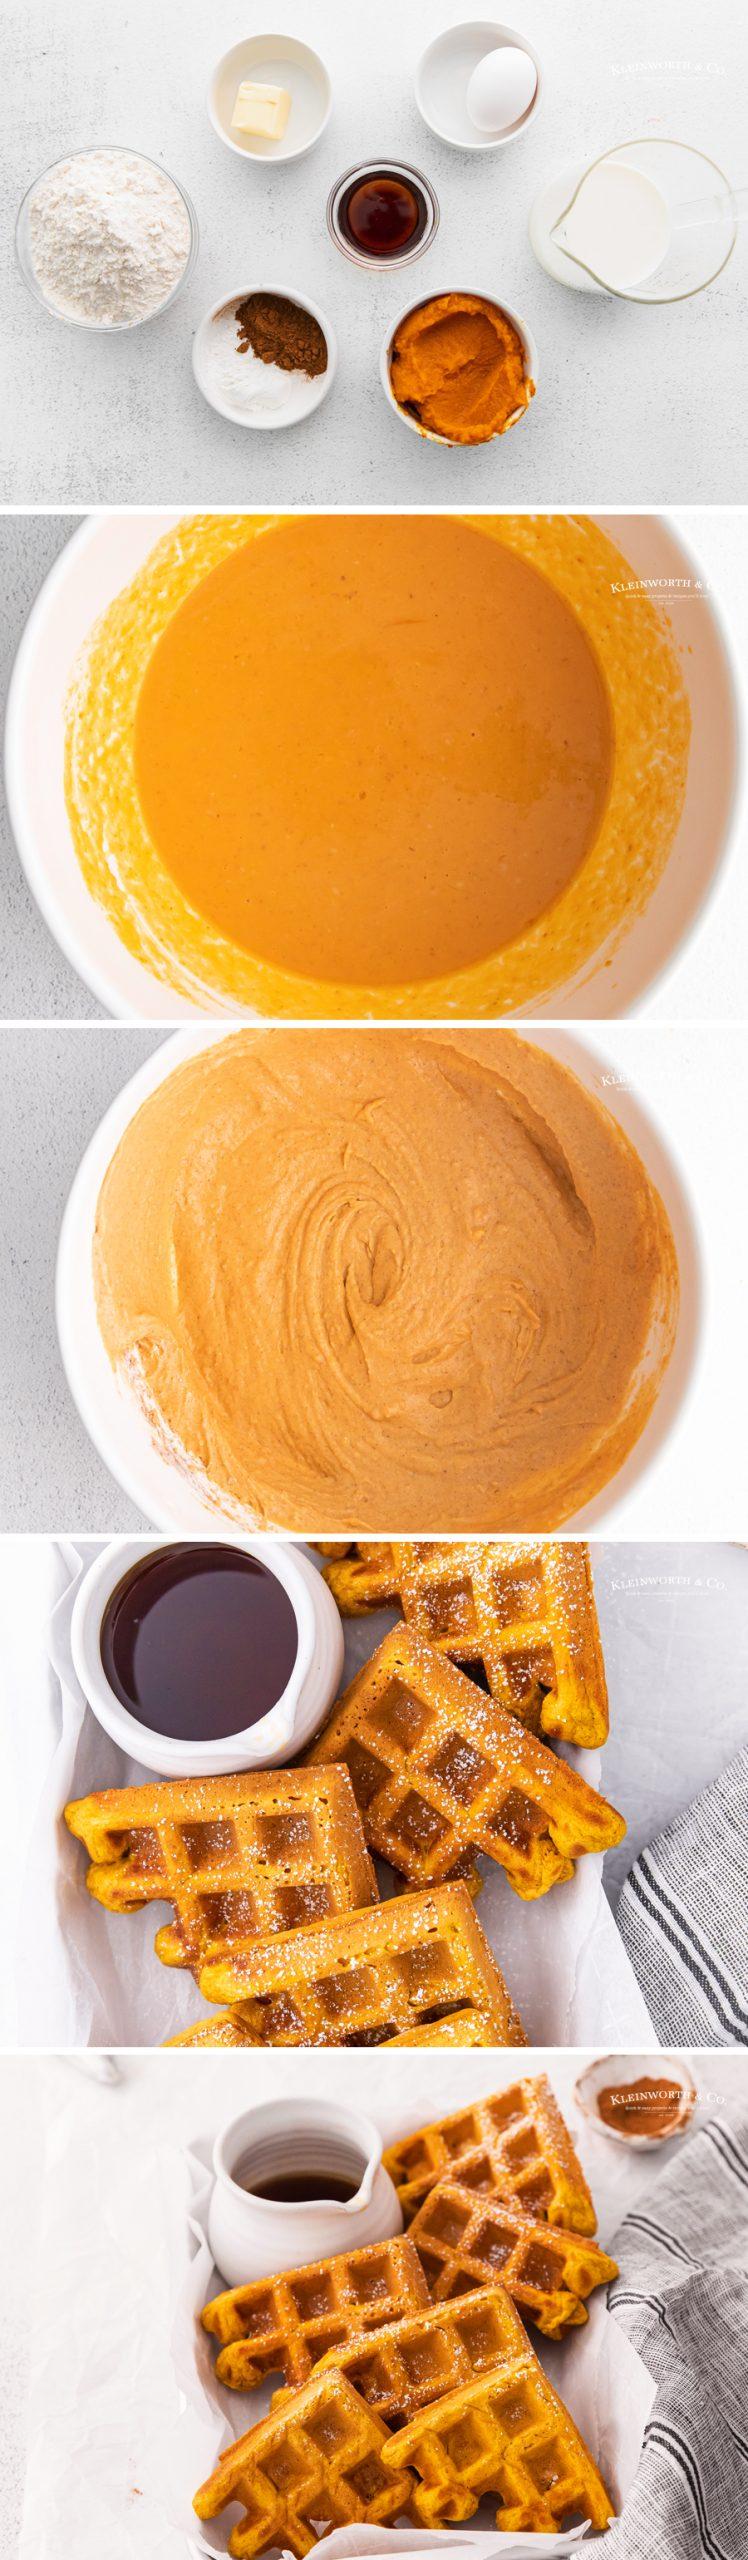 how to make Pumpkin Waffles